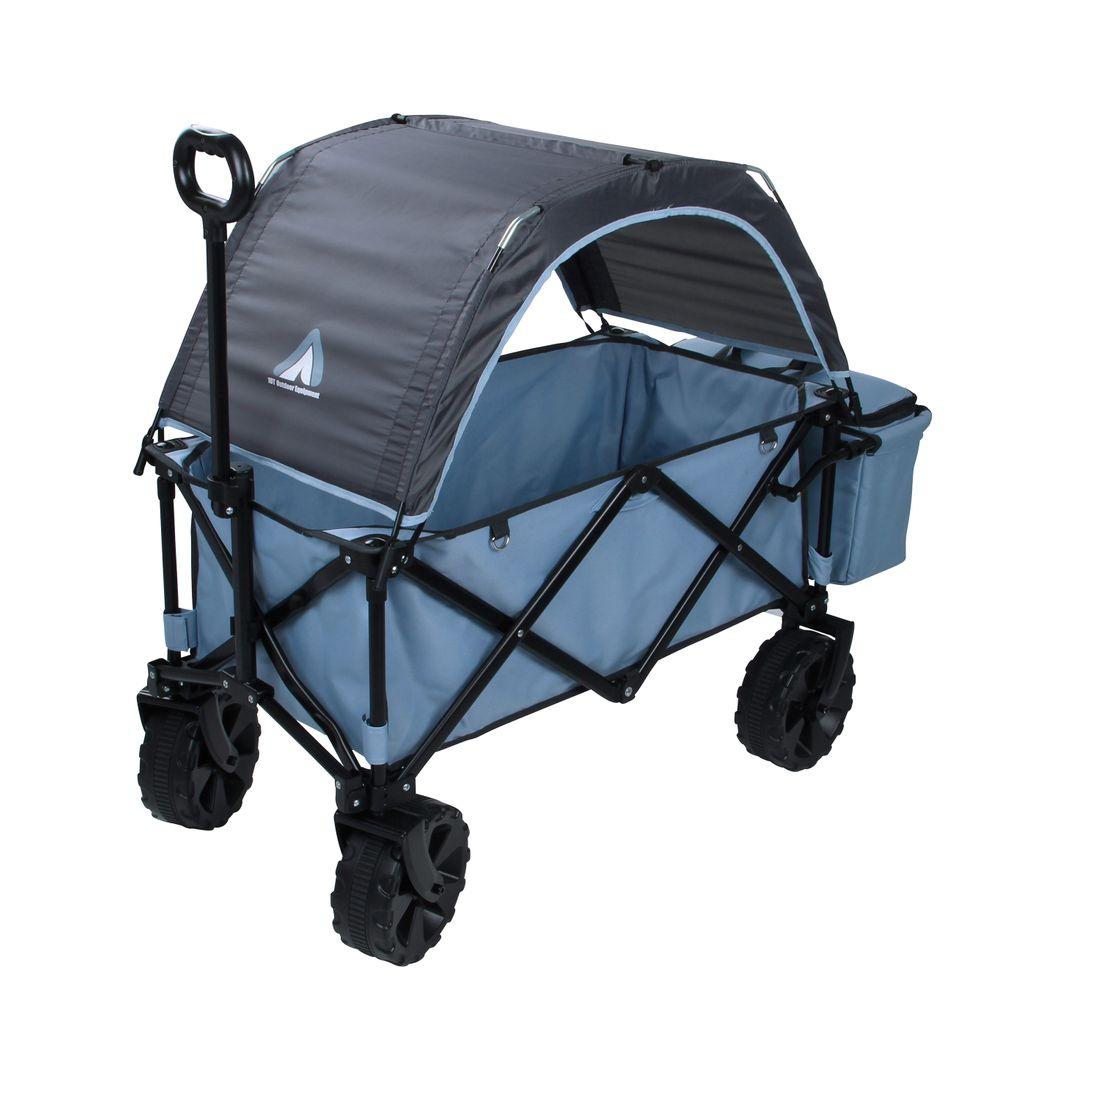 Trolley 10t Main ToitCharrette Avec Chariot À Roof Achetez D9IHWE2